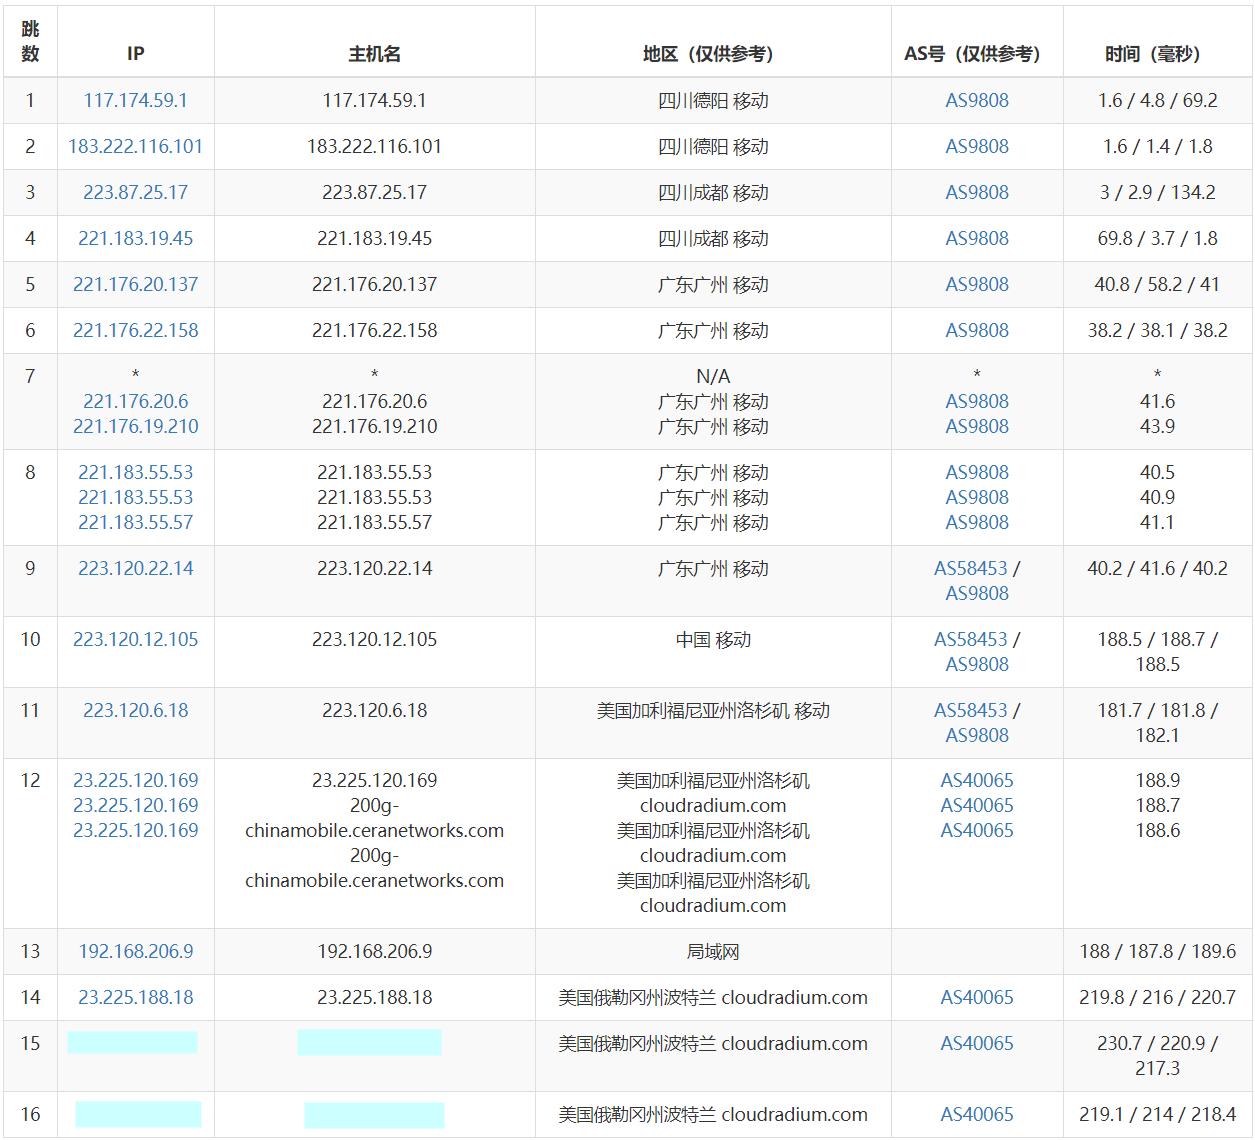 『测评』VMVM - 月付最低35RMB / 512M内存 / 15G硬盘 / 200Mbps / 2TB单向流量 / 20GB DDOS防御/ KVM / 美国波特兰(PDX) 主机测评 第6张